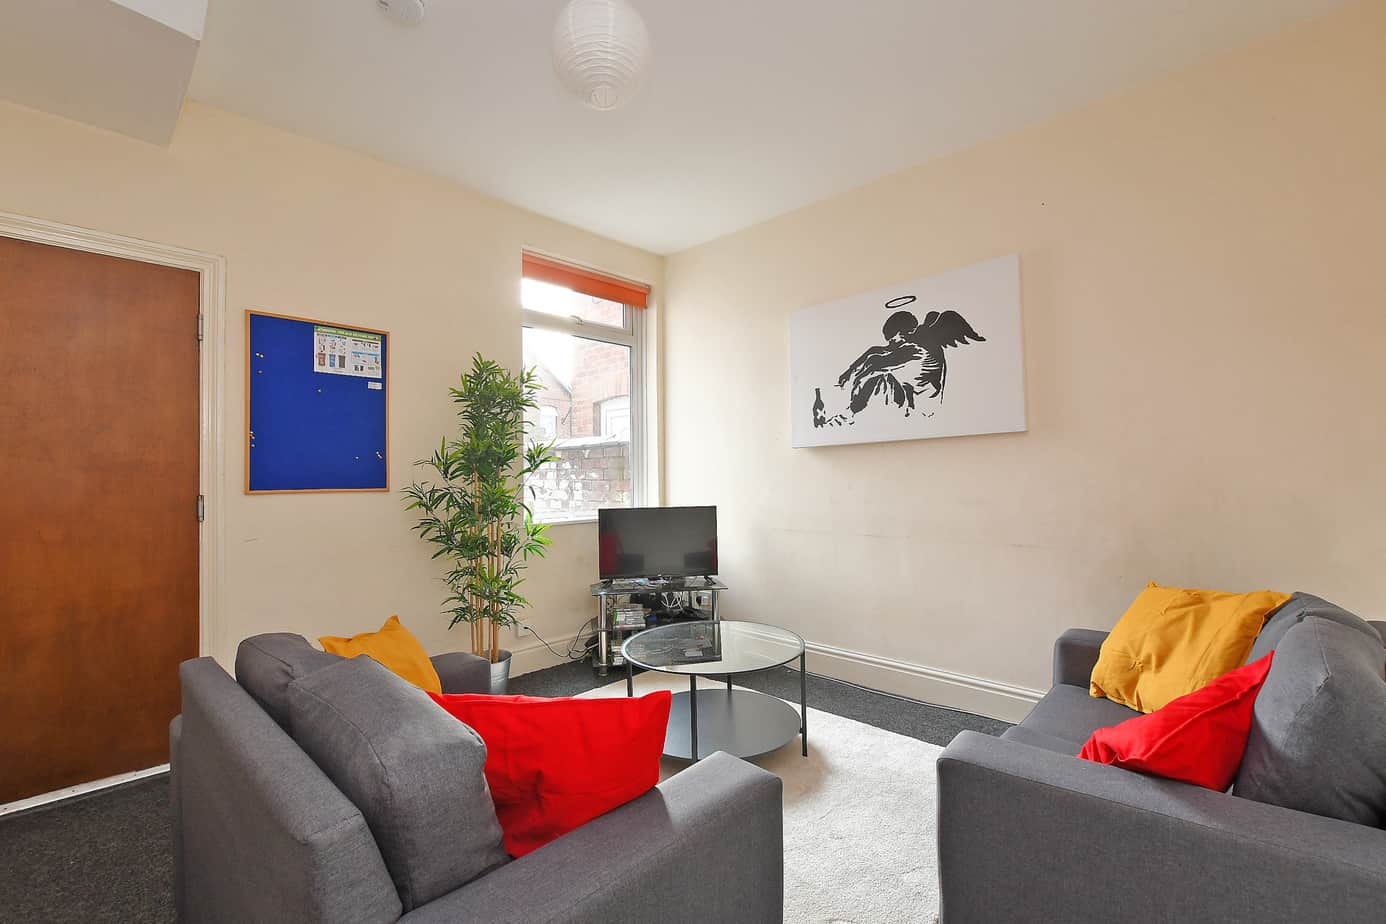 32 Margaret Street – 4 Bed Student Home